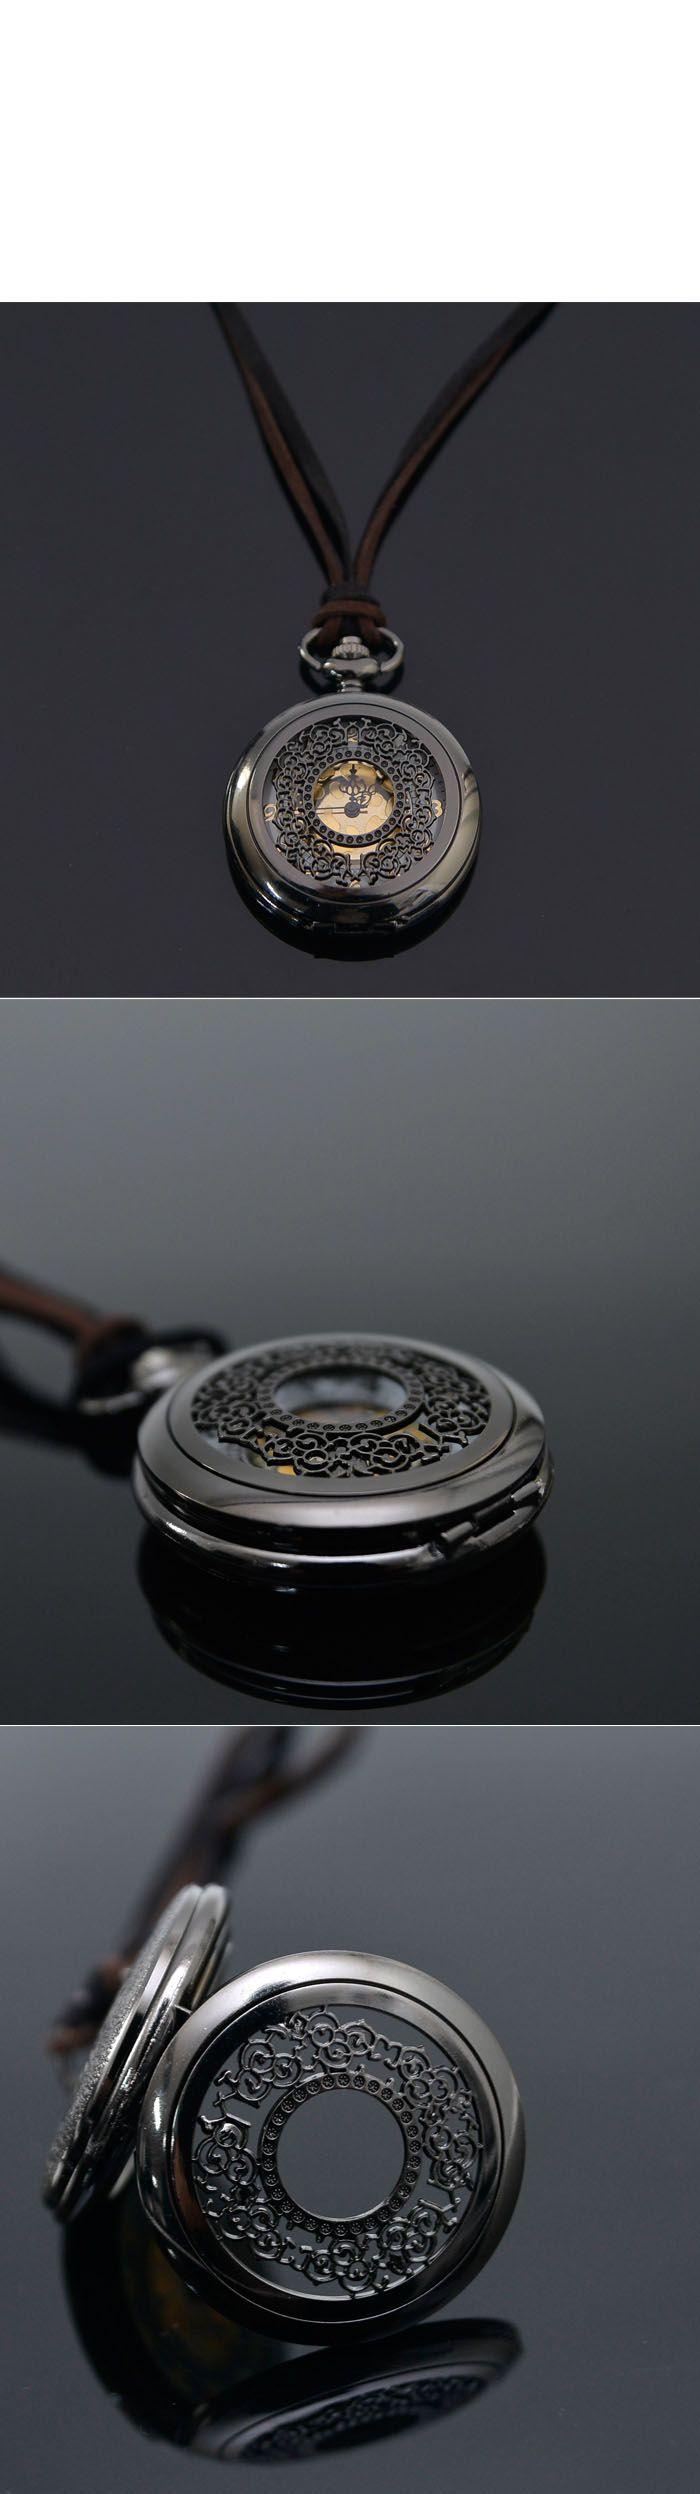 Accessories :: Necklaces :: Romantic Long Locket Watchnecklace 183  Mens  Fashion